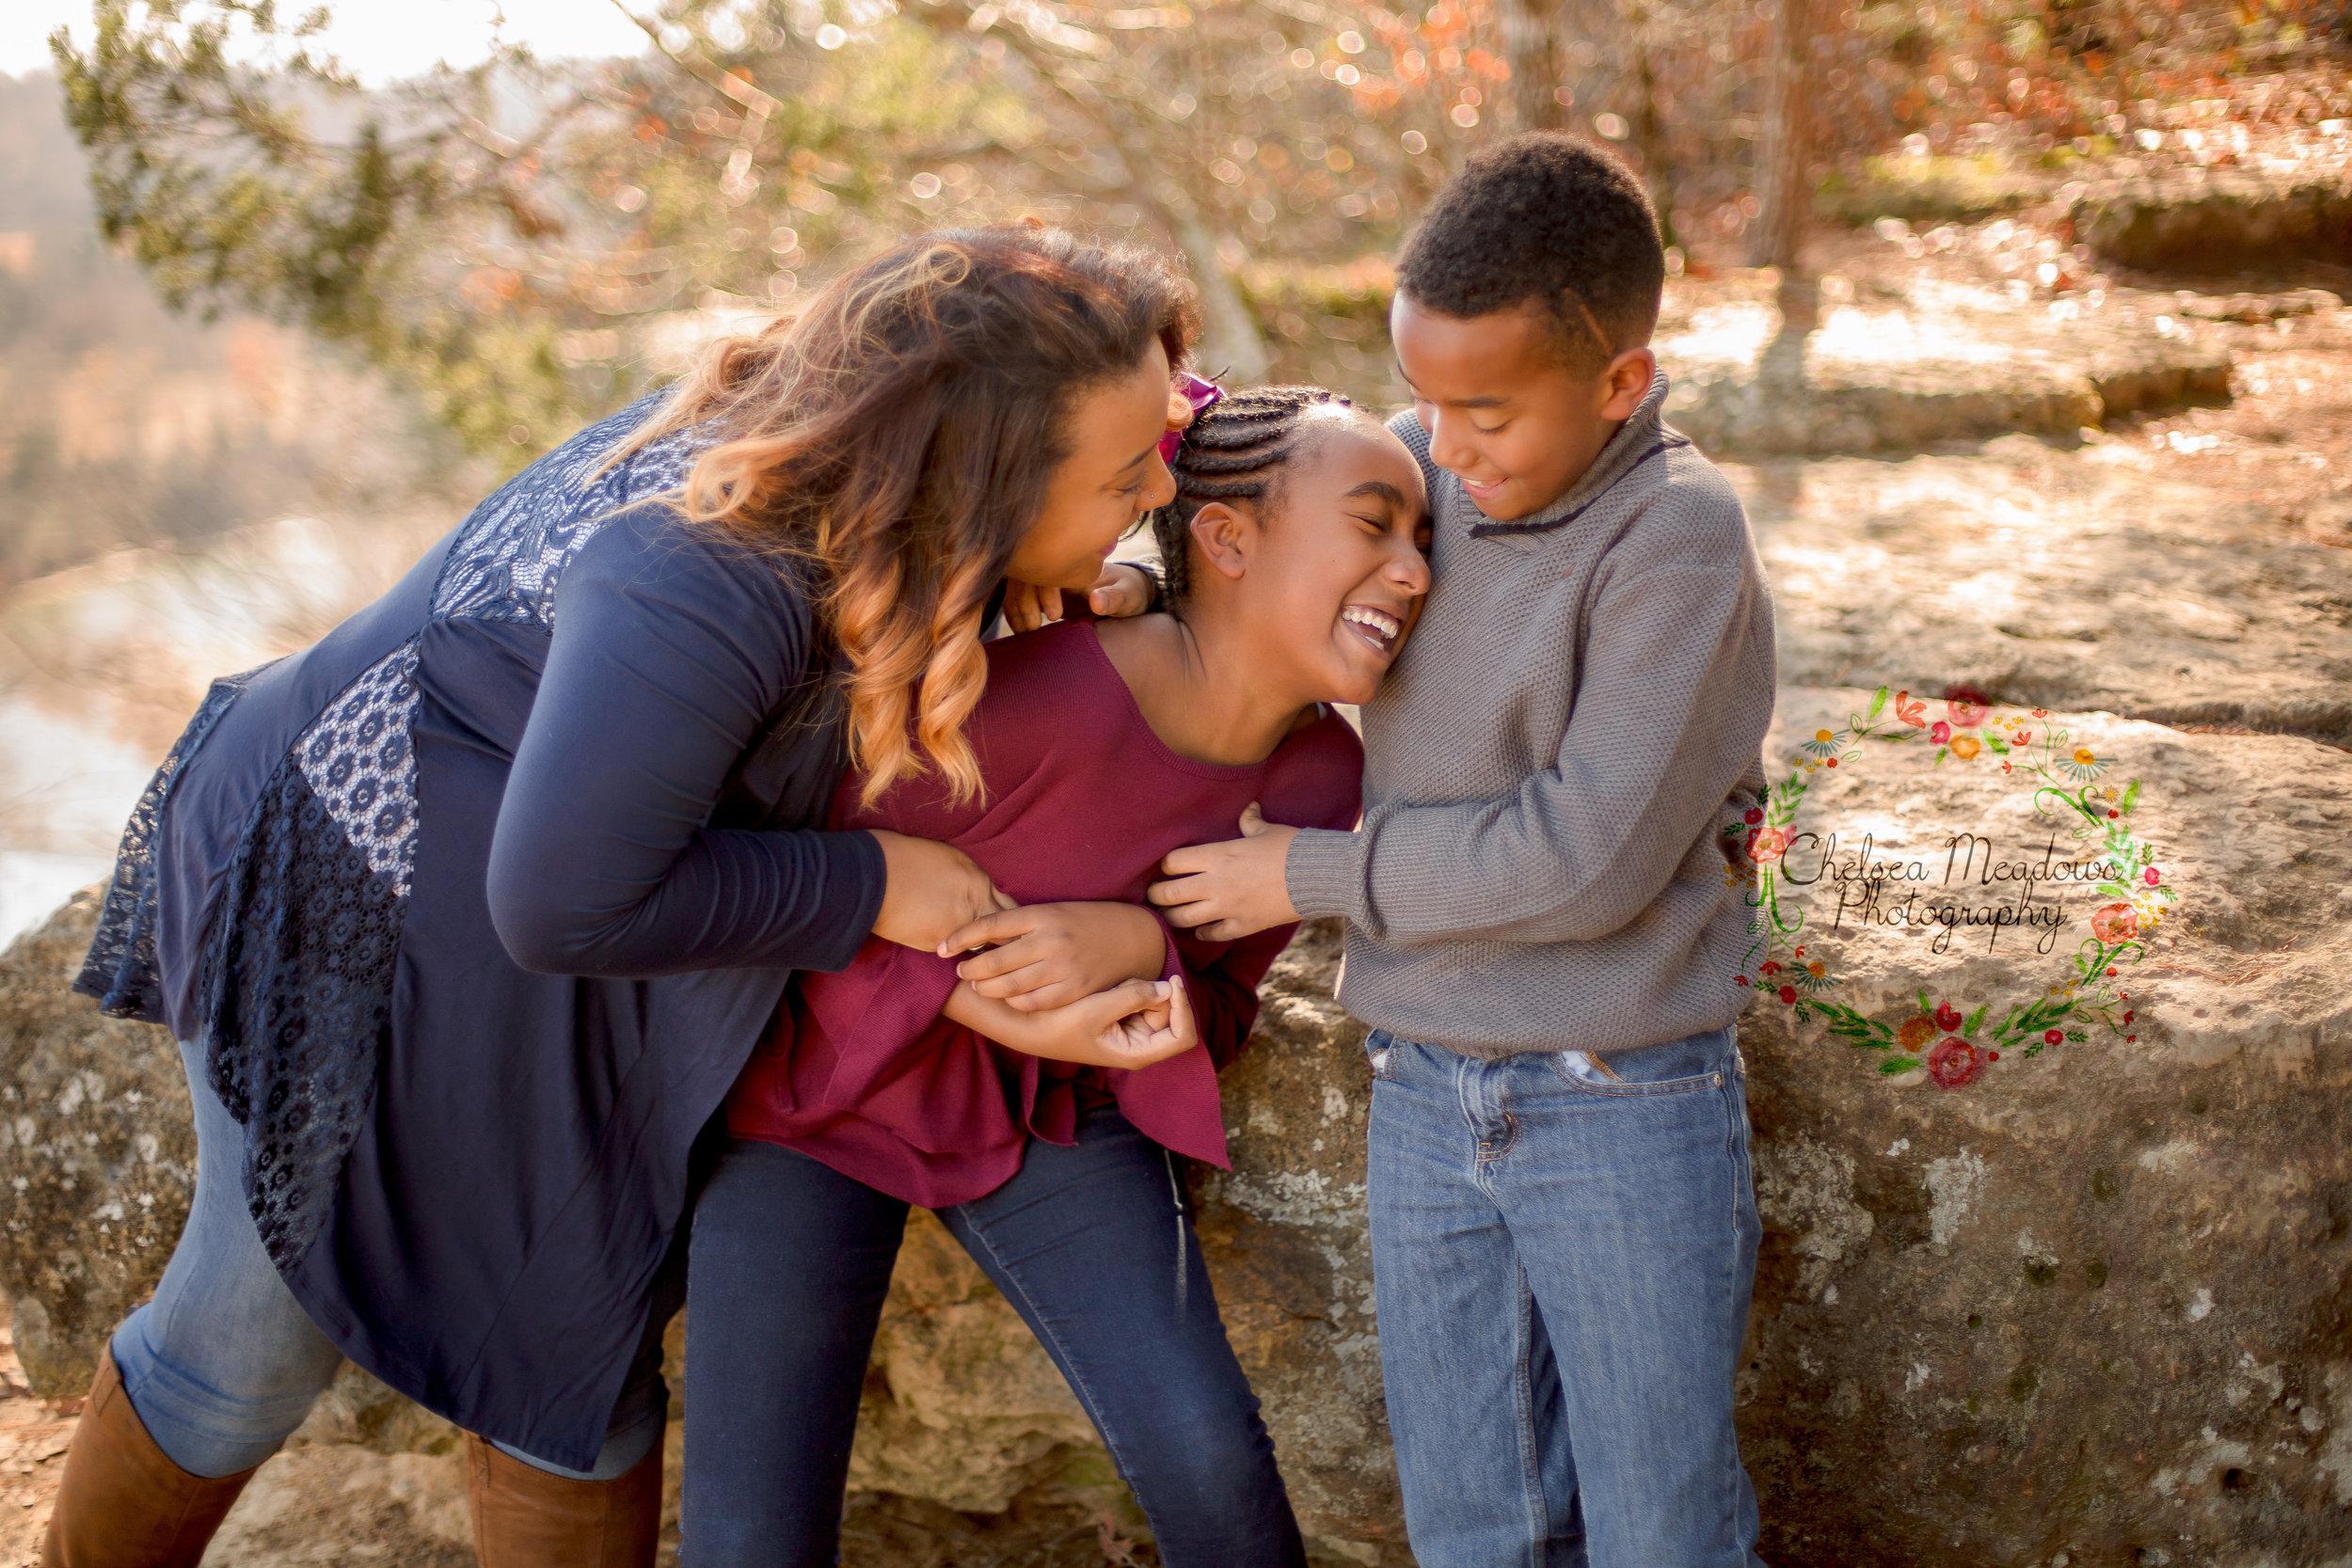 Nelson Family - Nashville Family Photographer - Chelsea Meadows Photography (12).jpg